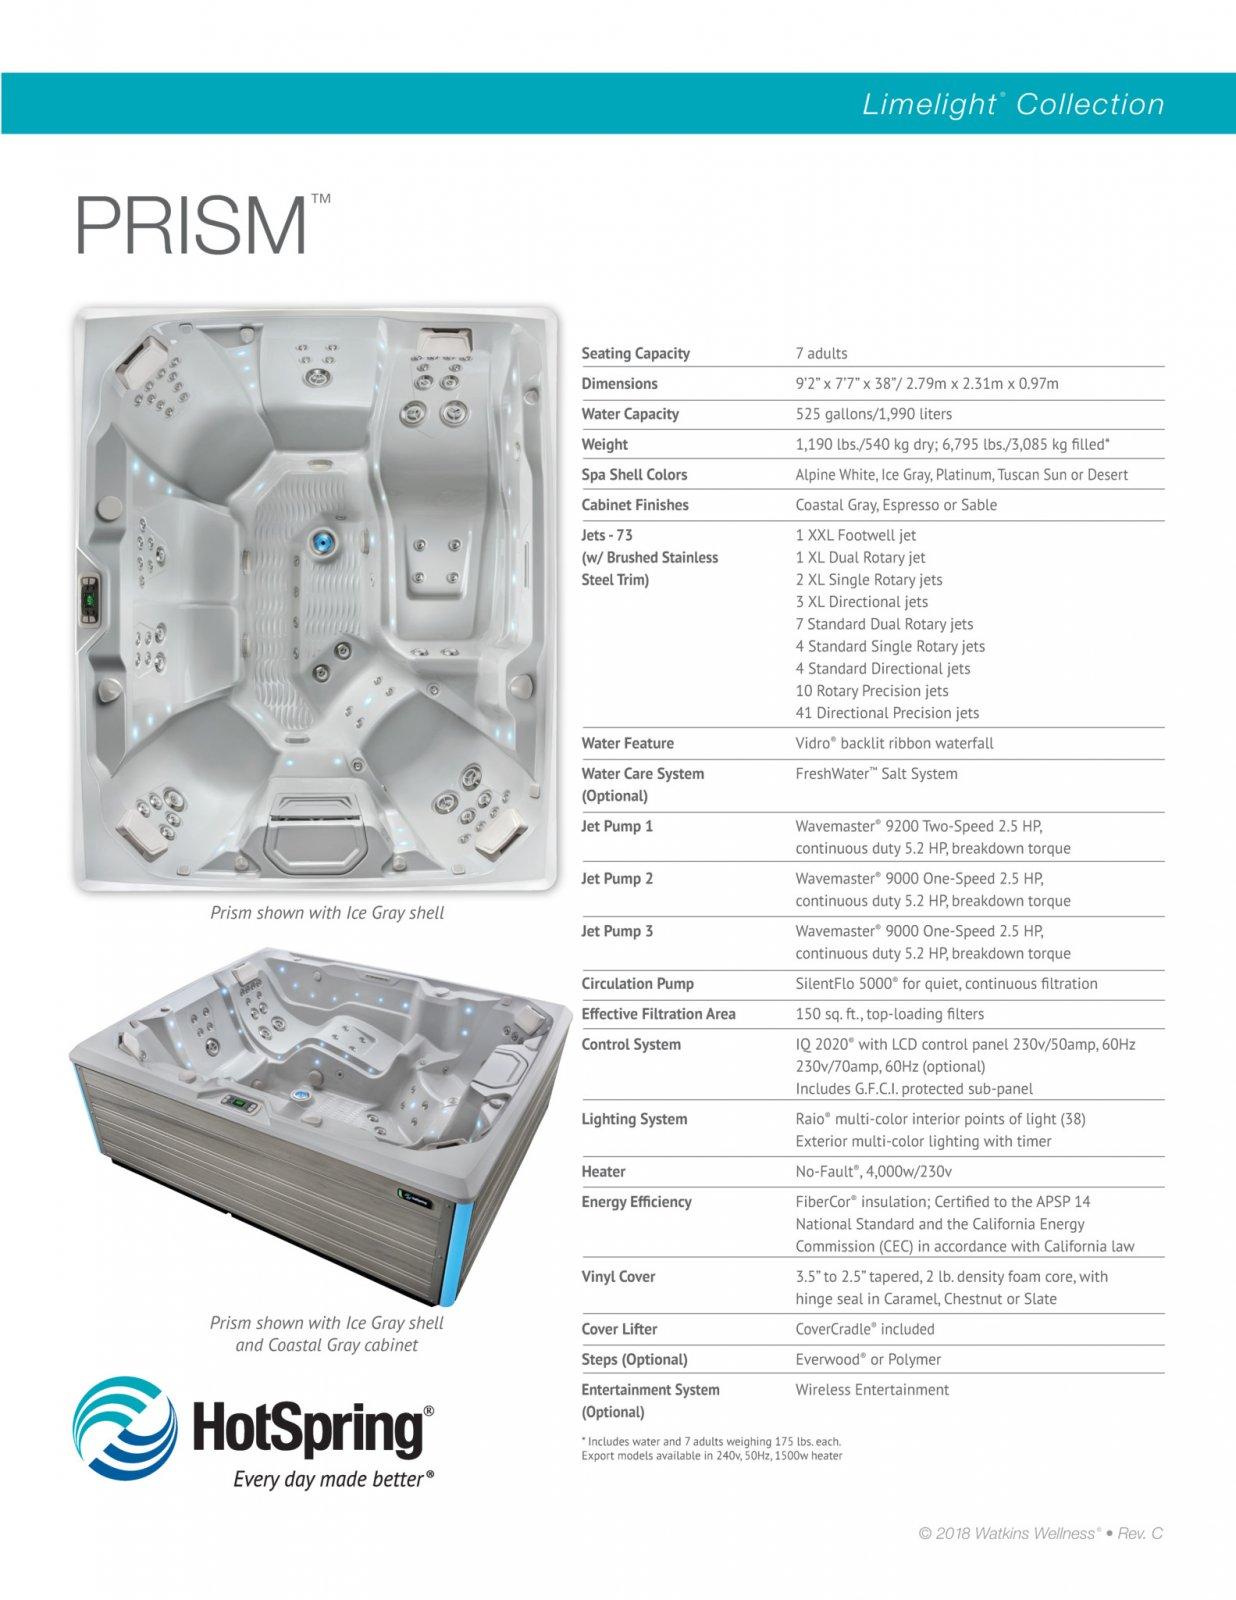 HotSpring Limelight Prism specs